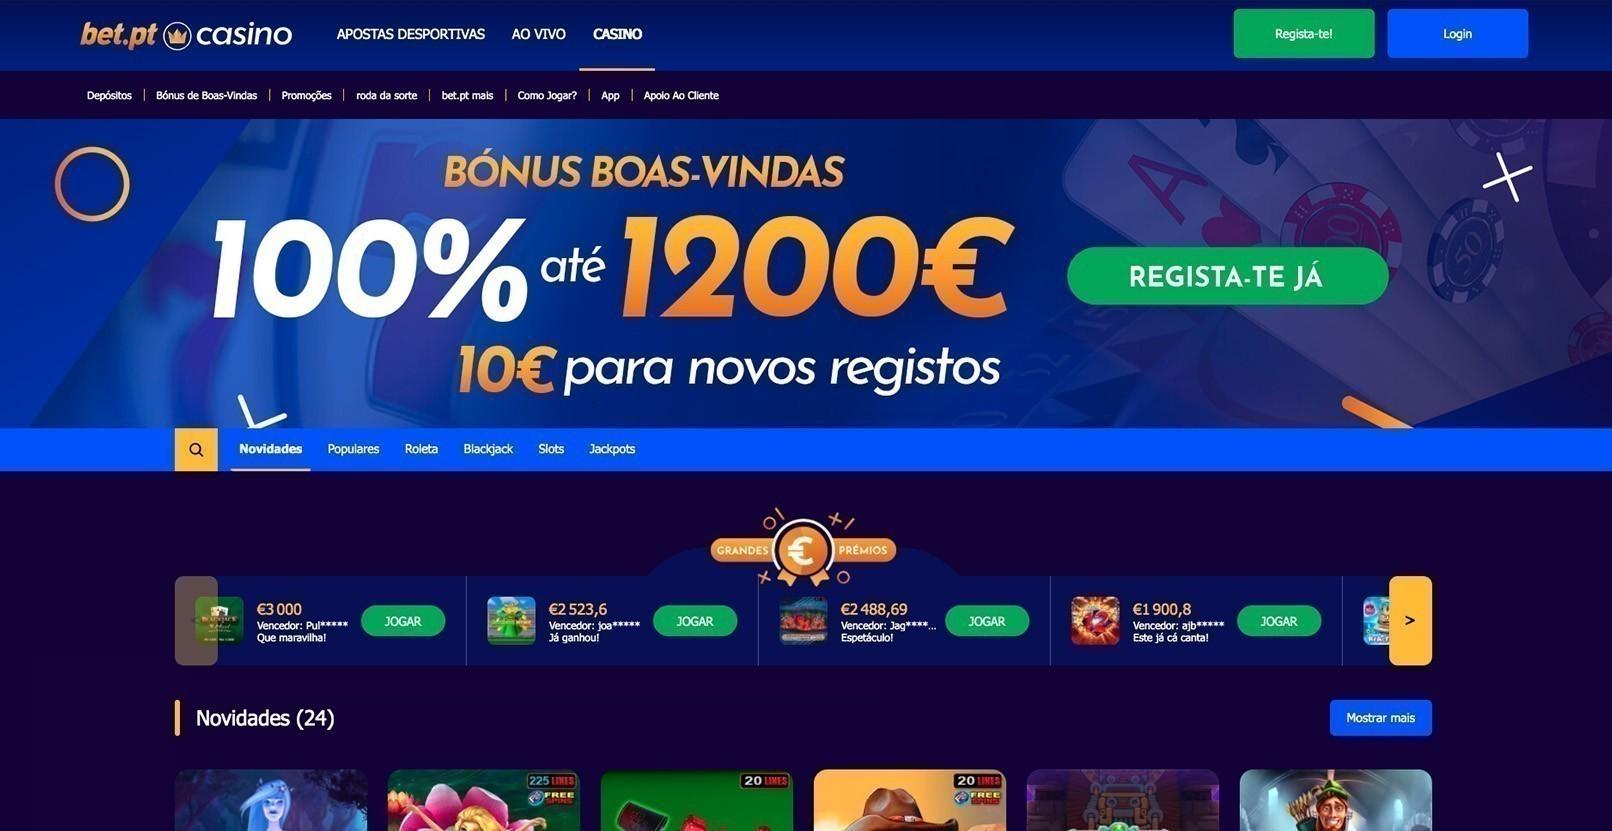 Casino Bet.pt